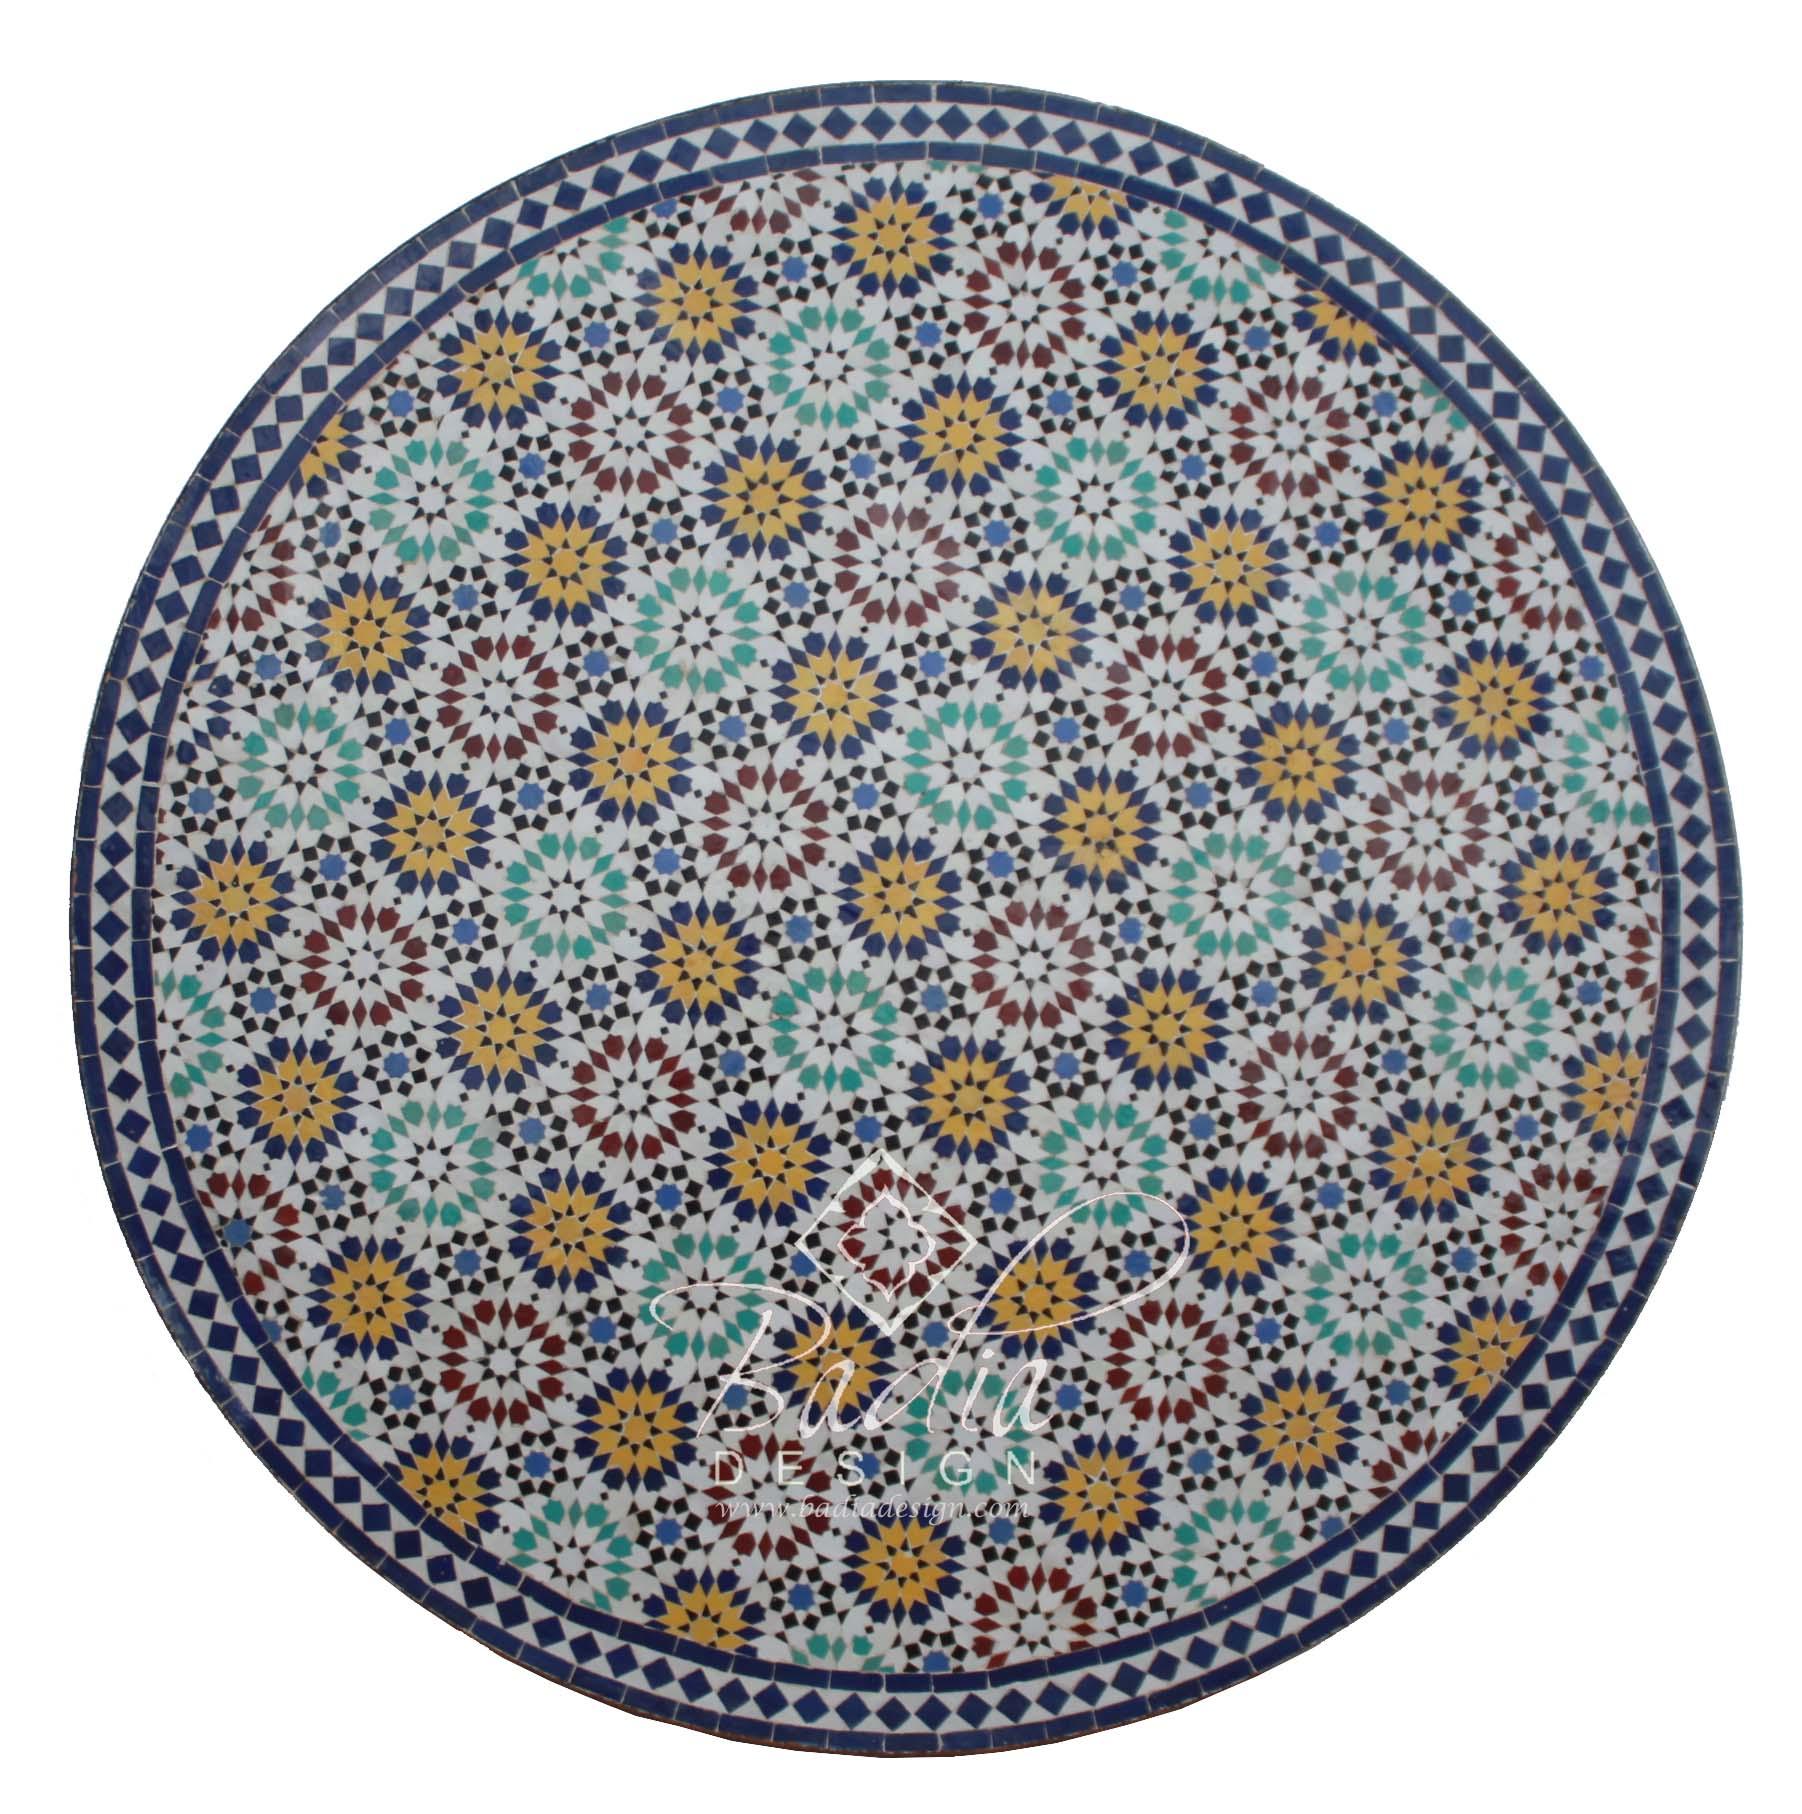 moroccan-ceramic-tile-table-top-mtr265.jpg